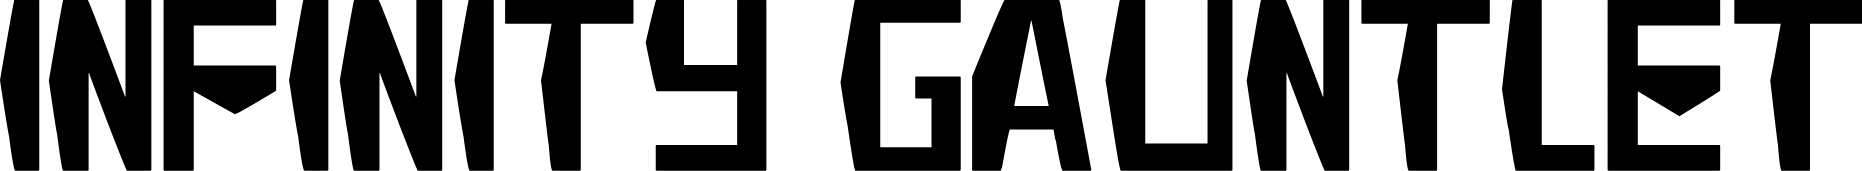 Infinity War Fonts Fontspace